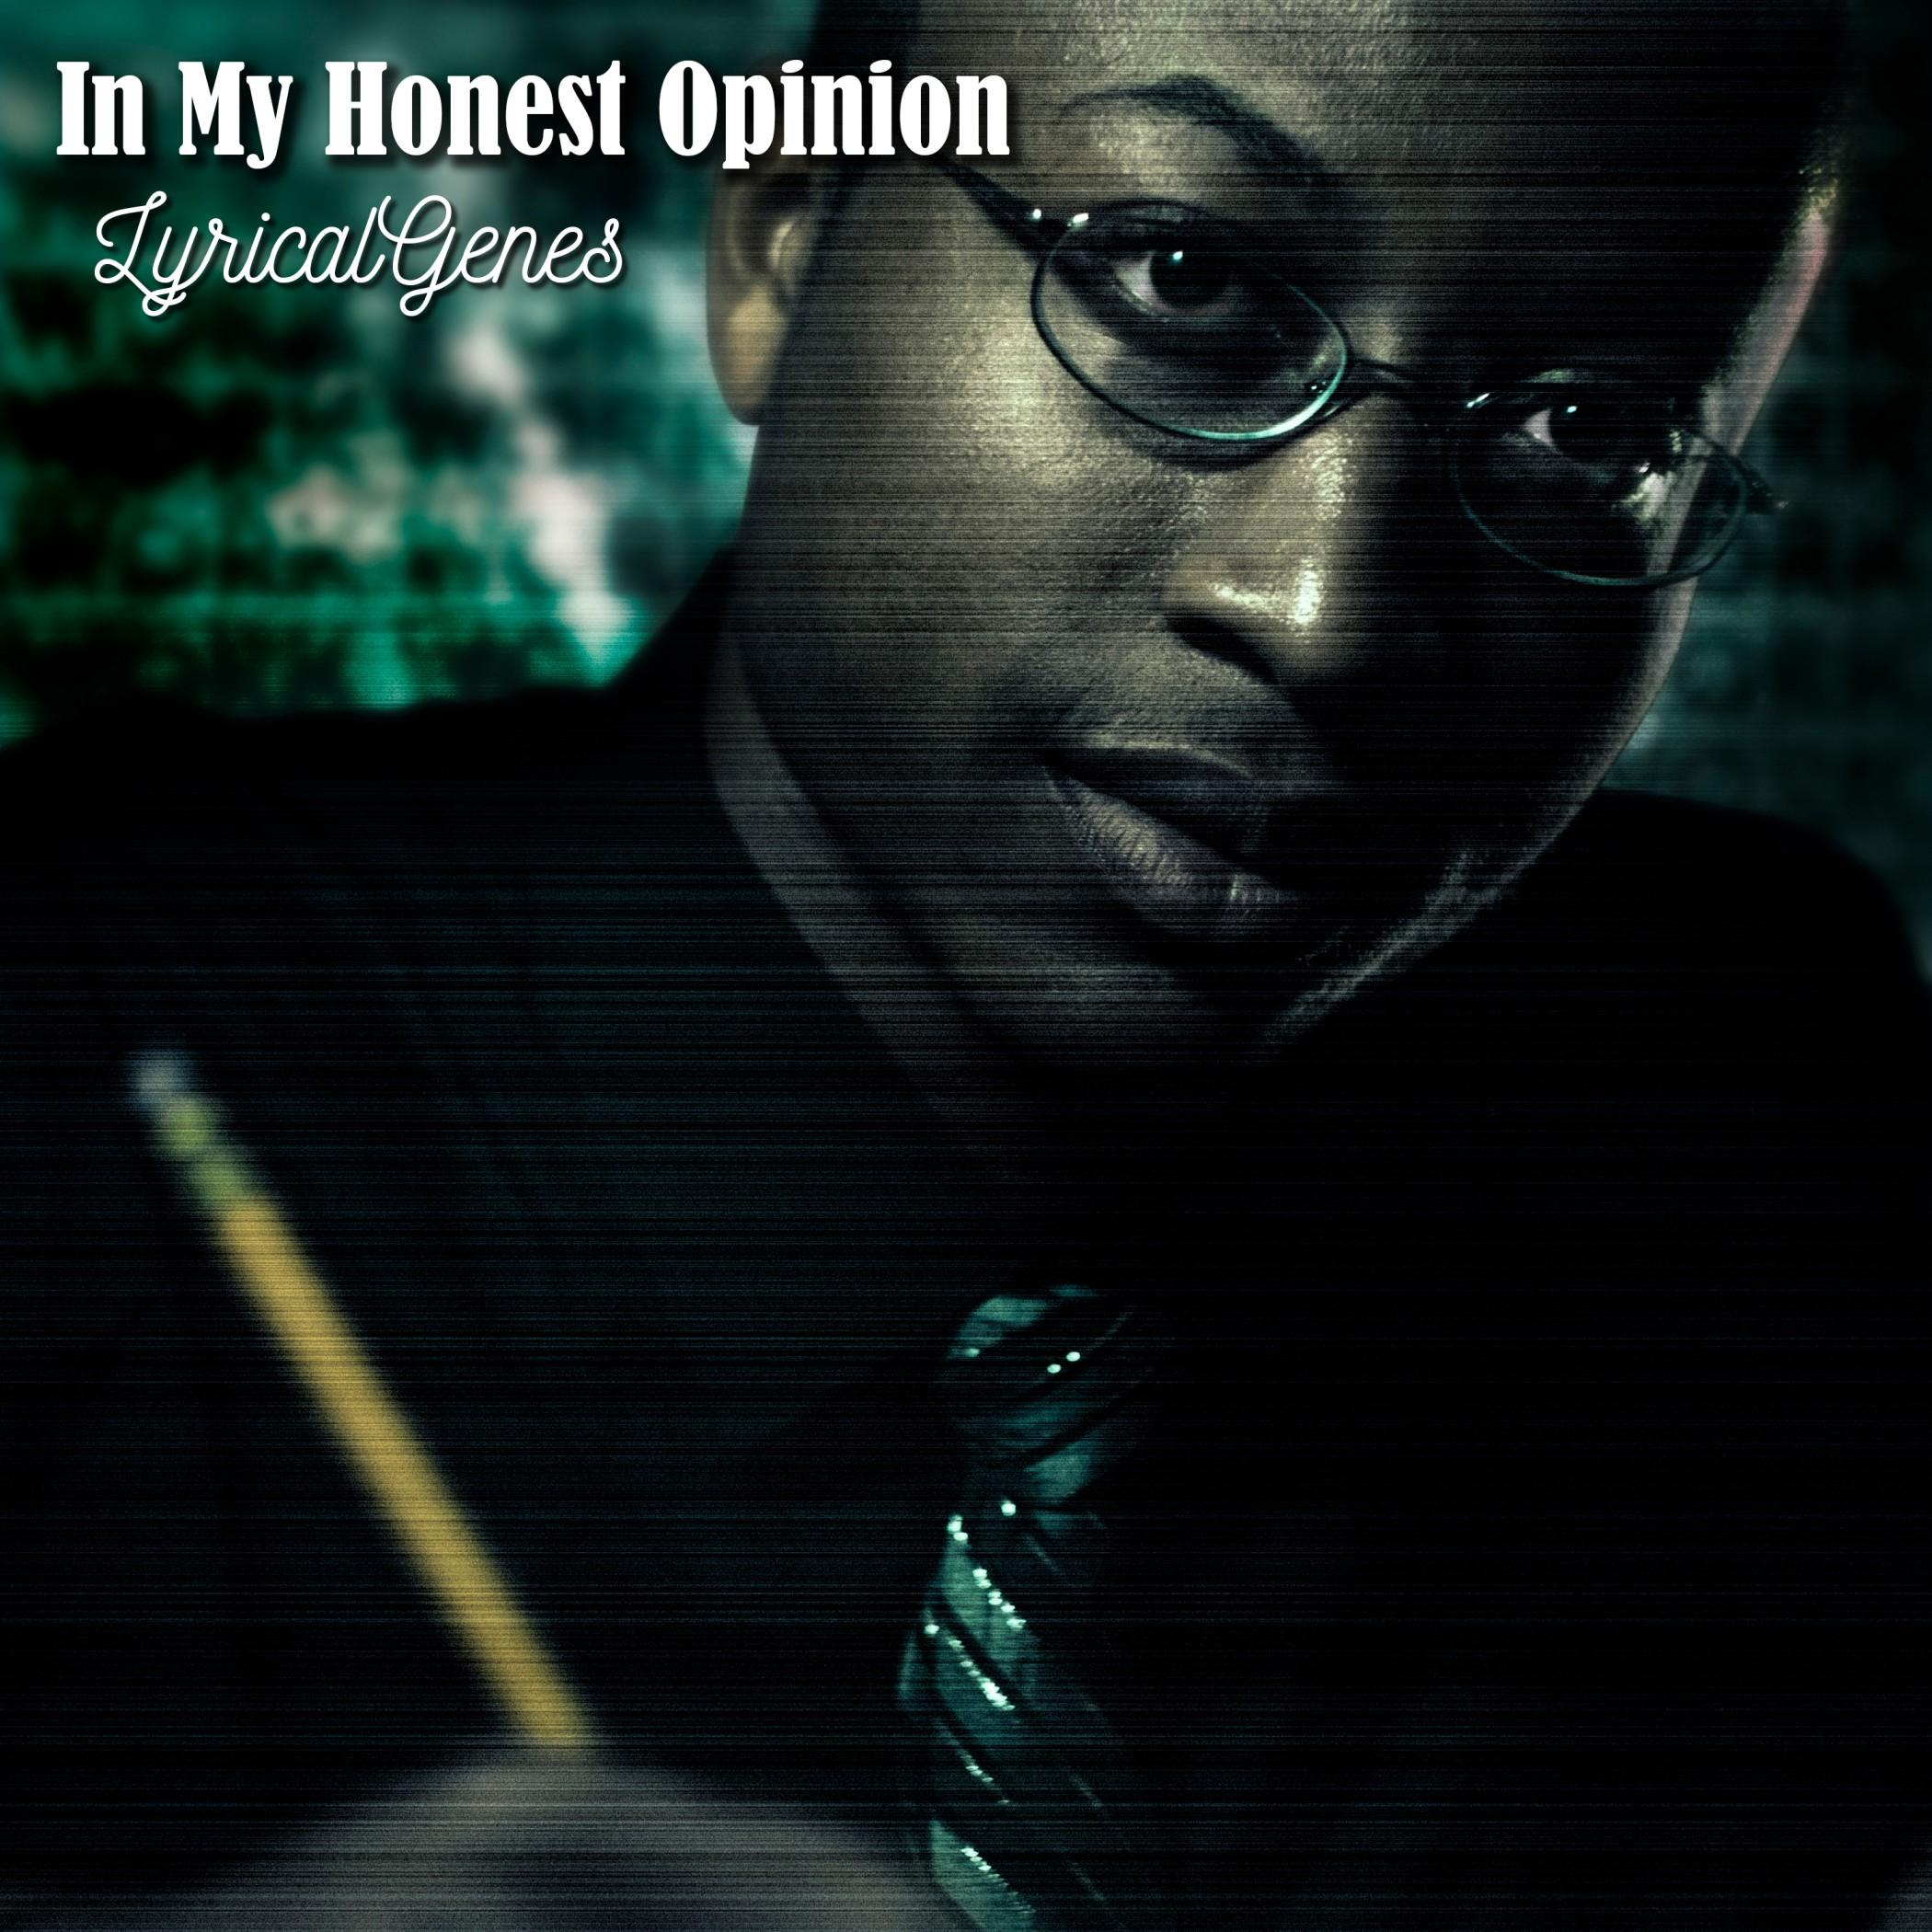 LyricalGenes Releases his Newest Album 'In My Honest Opinion'